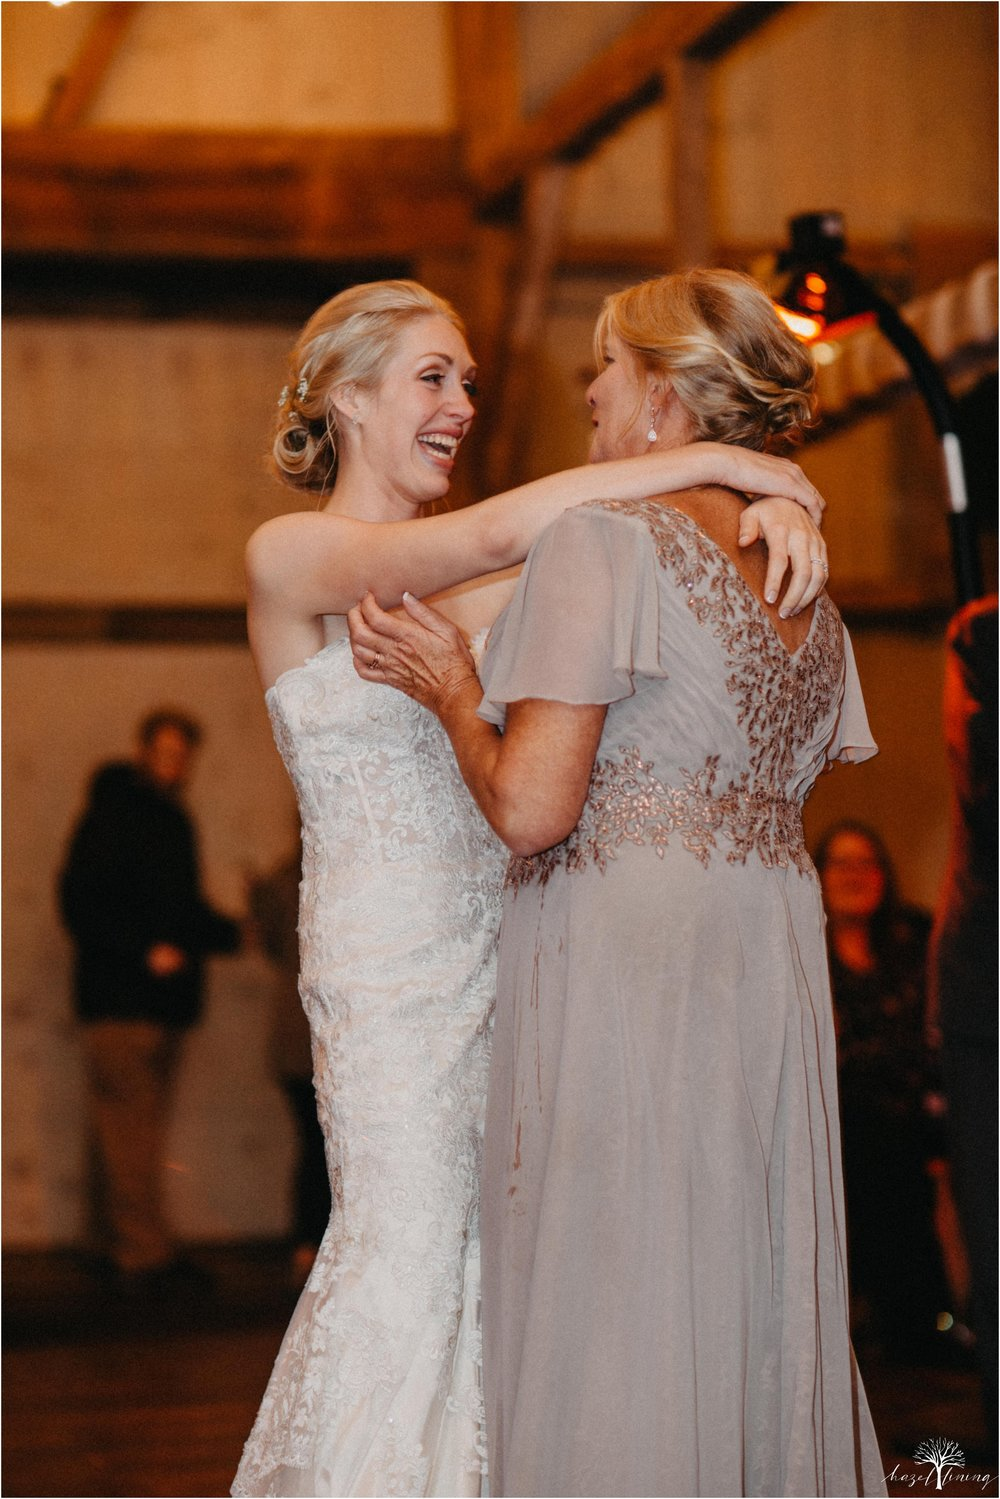 briana-krans-greg-johnston-farm-bakery-and-events-fall-wedding_0163.jpg